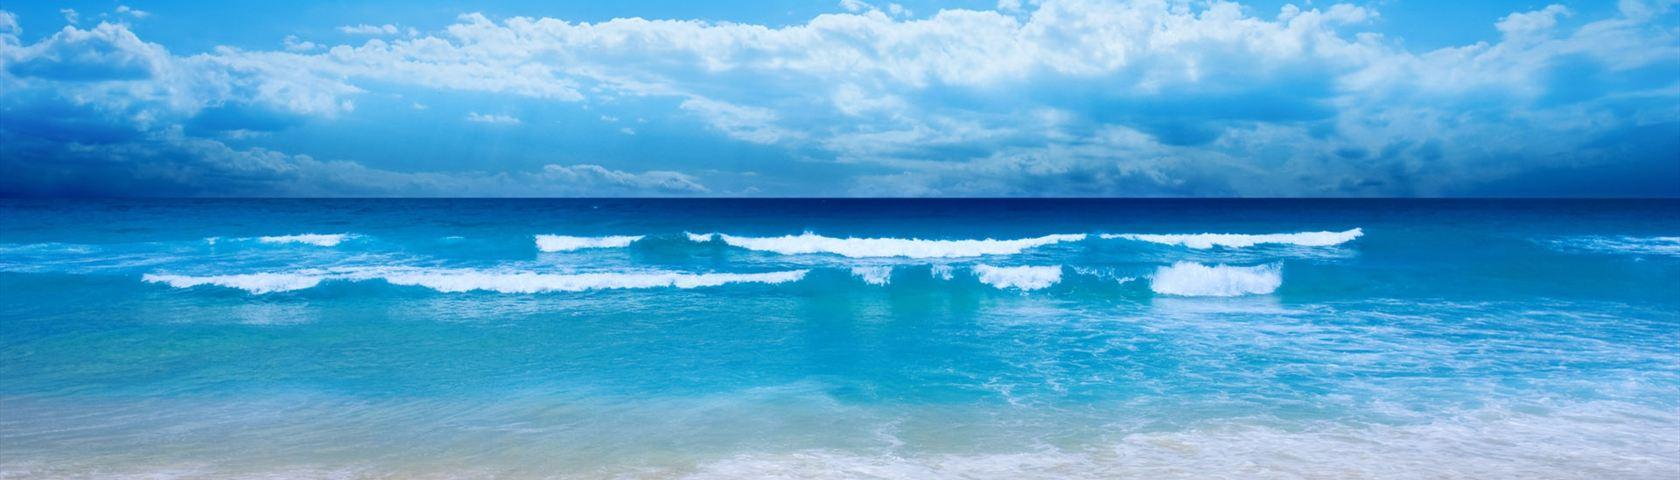 Blue Water Beach